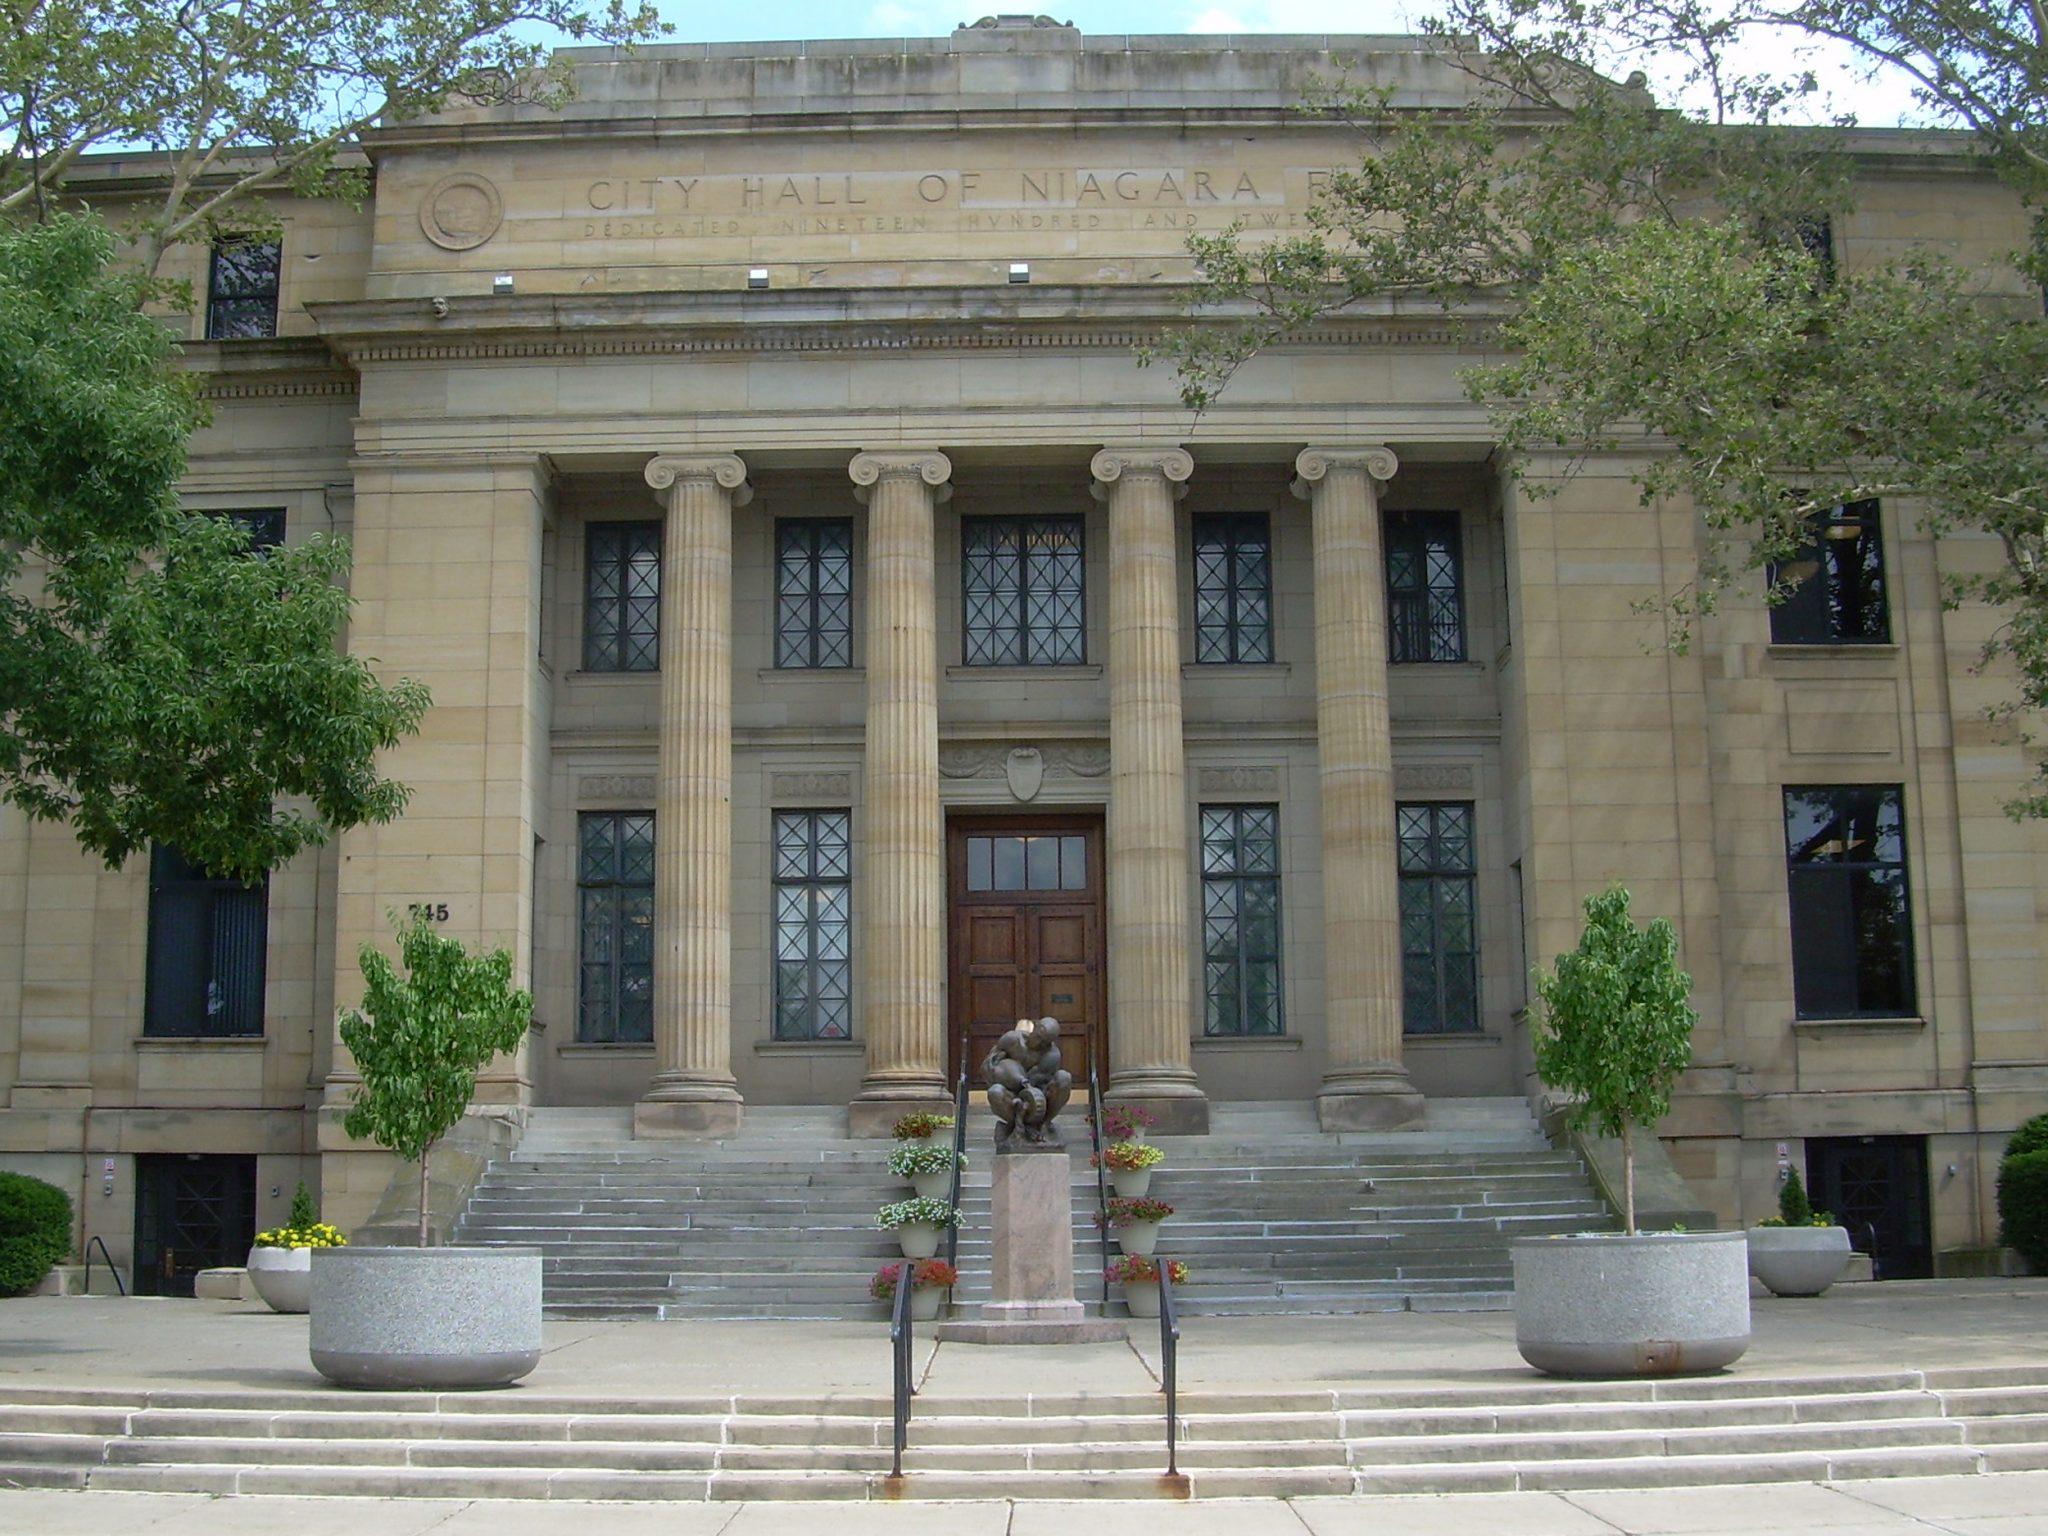 Niagara Falls City Hall Facade Restoration Hhl Architects